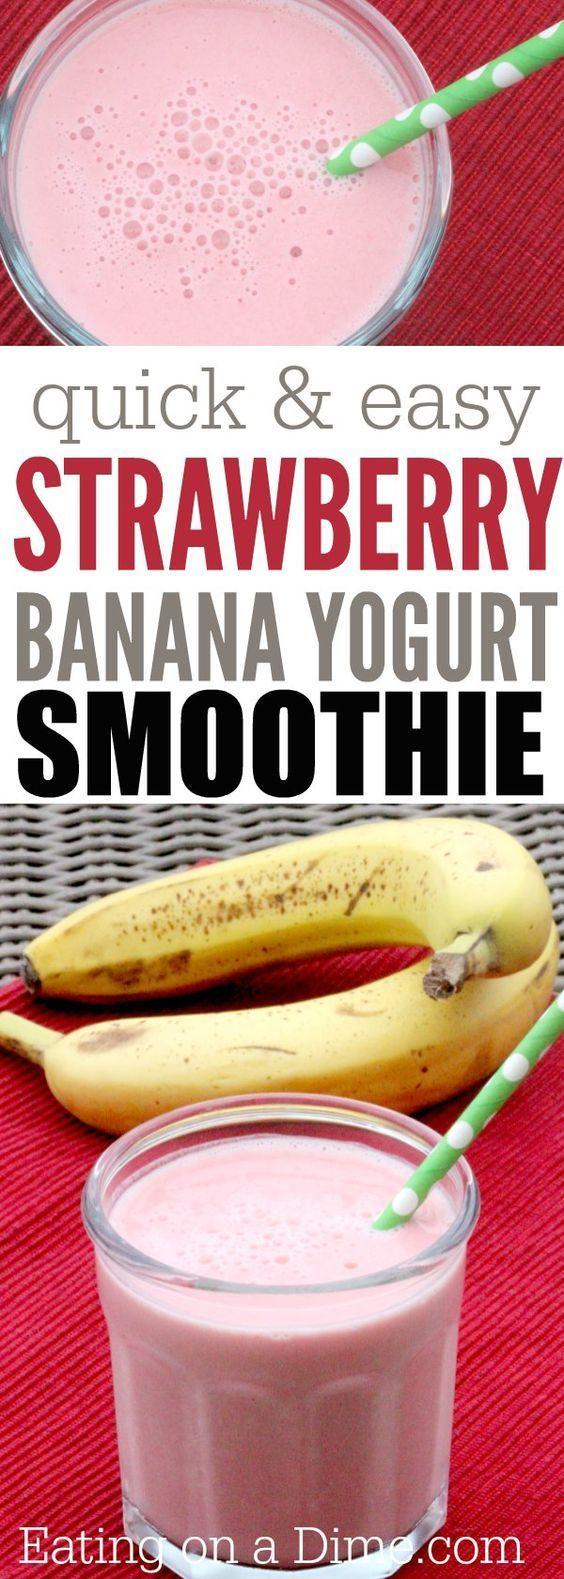 Yogurt Strawberry Banana Smoothie Recipe - Eating on a Dime